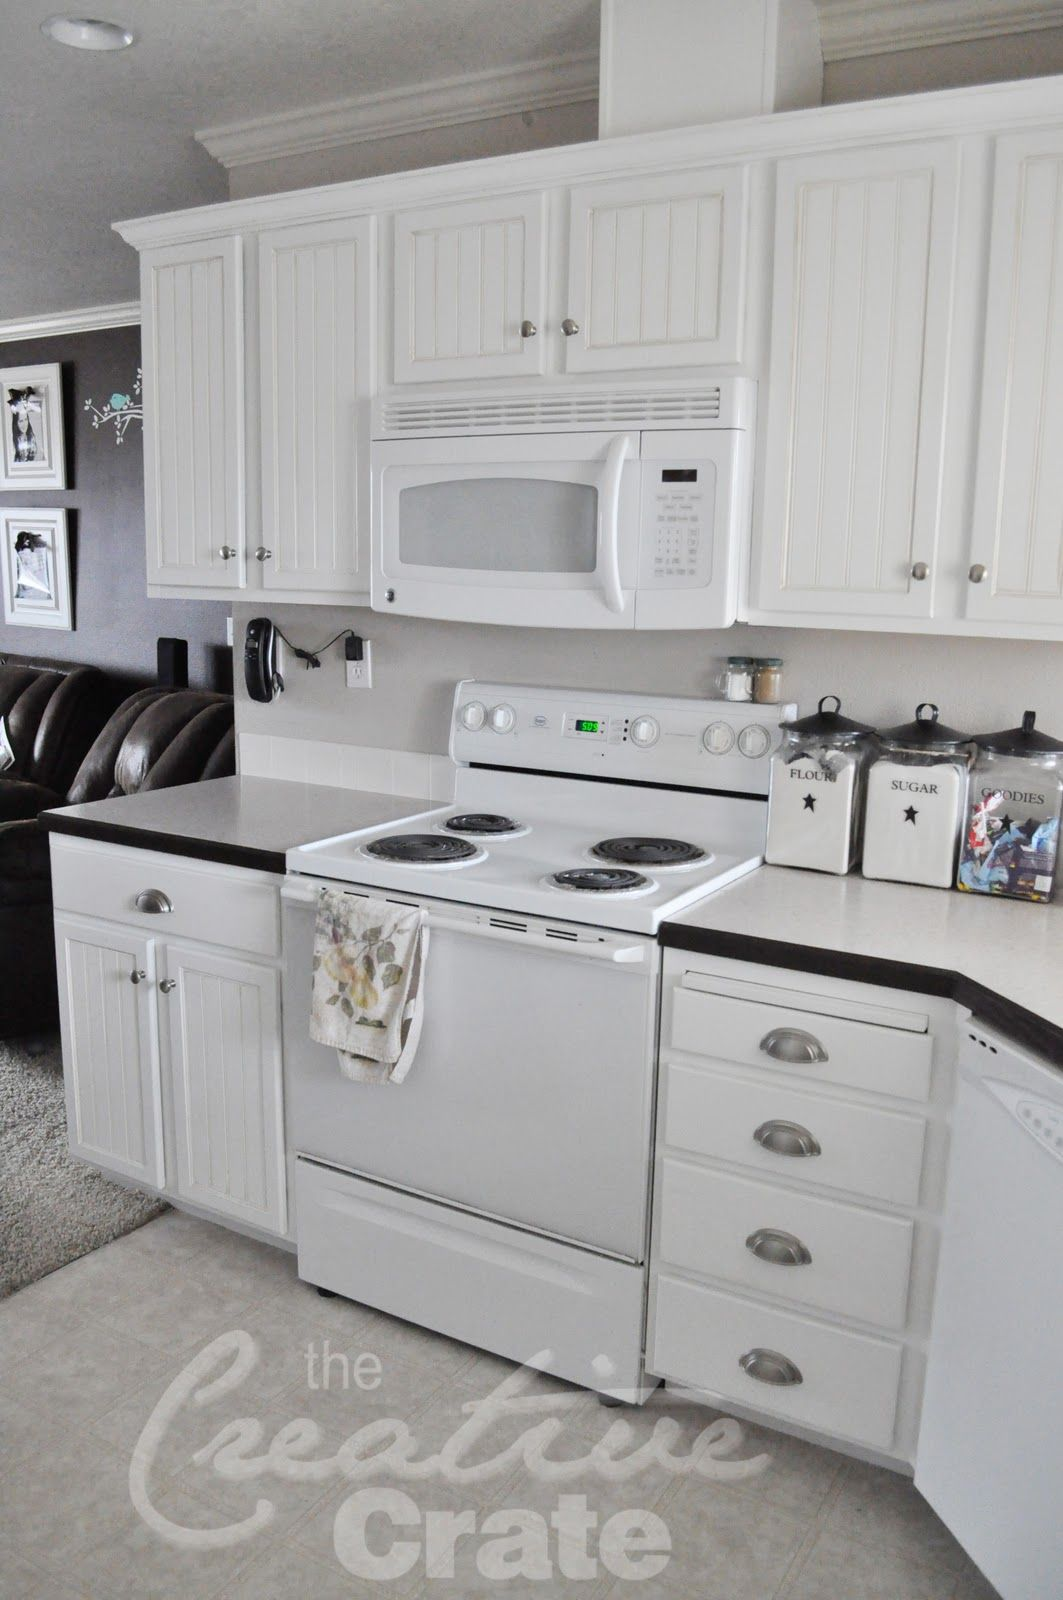 Classy White Beadboard Wallpaper Cabinets Feat Concrete Countertop In Cheap White Kitchen Deco Beadboard Kitchen Beadboard Kitchen Cabinets Wainscoting Kitchen